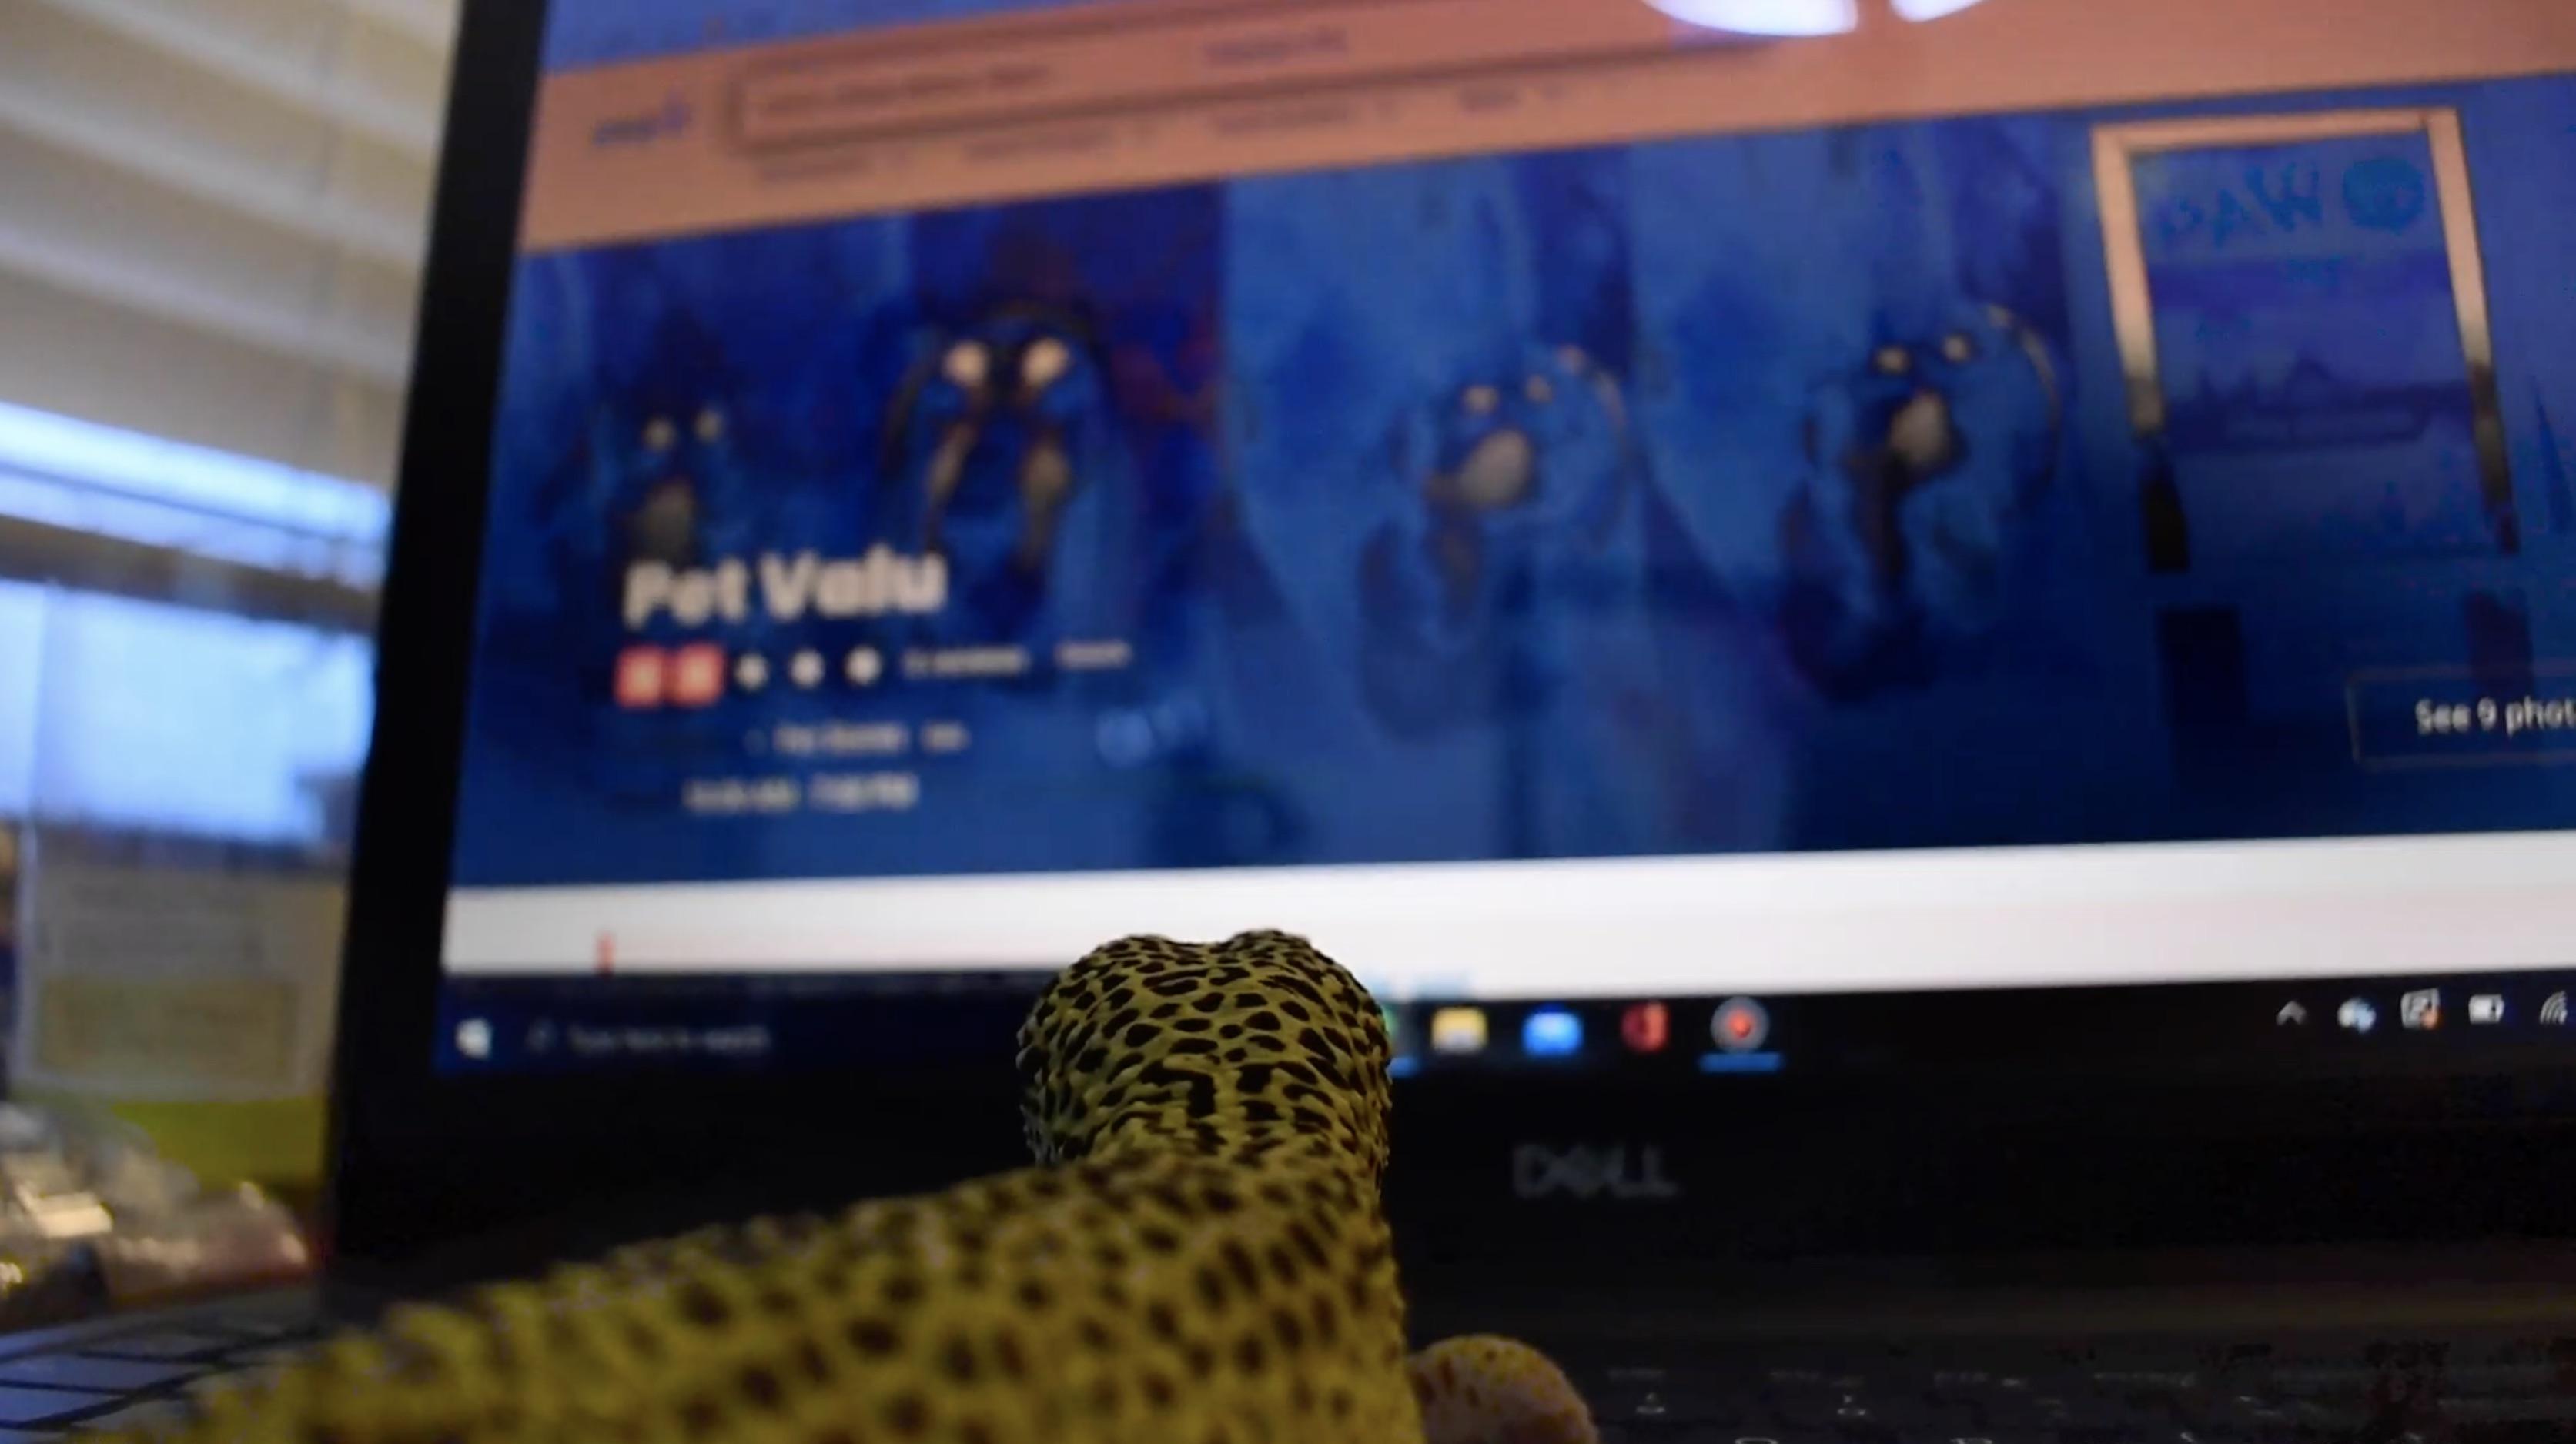 A lizard looking at pet valu's website